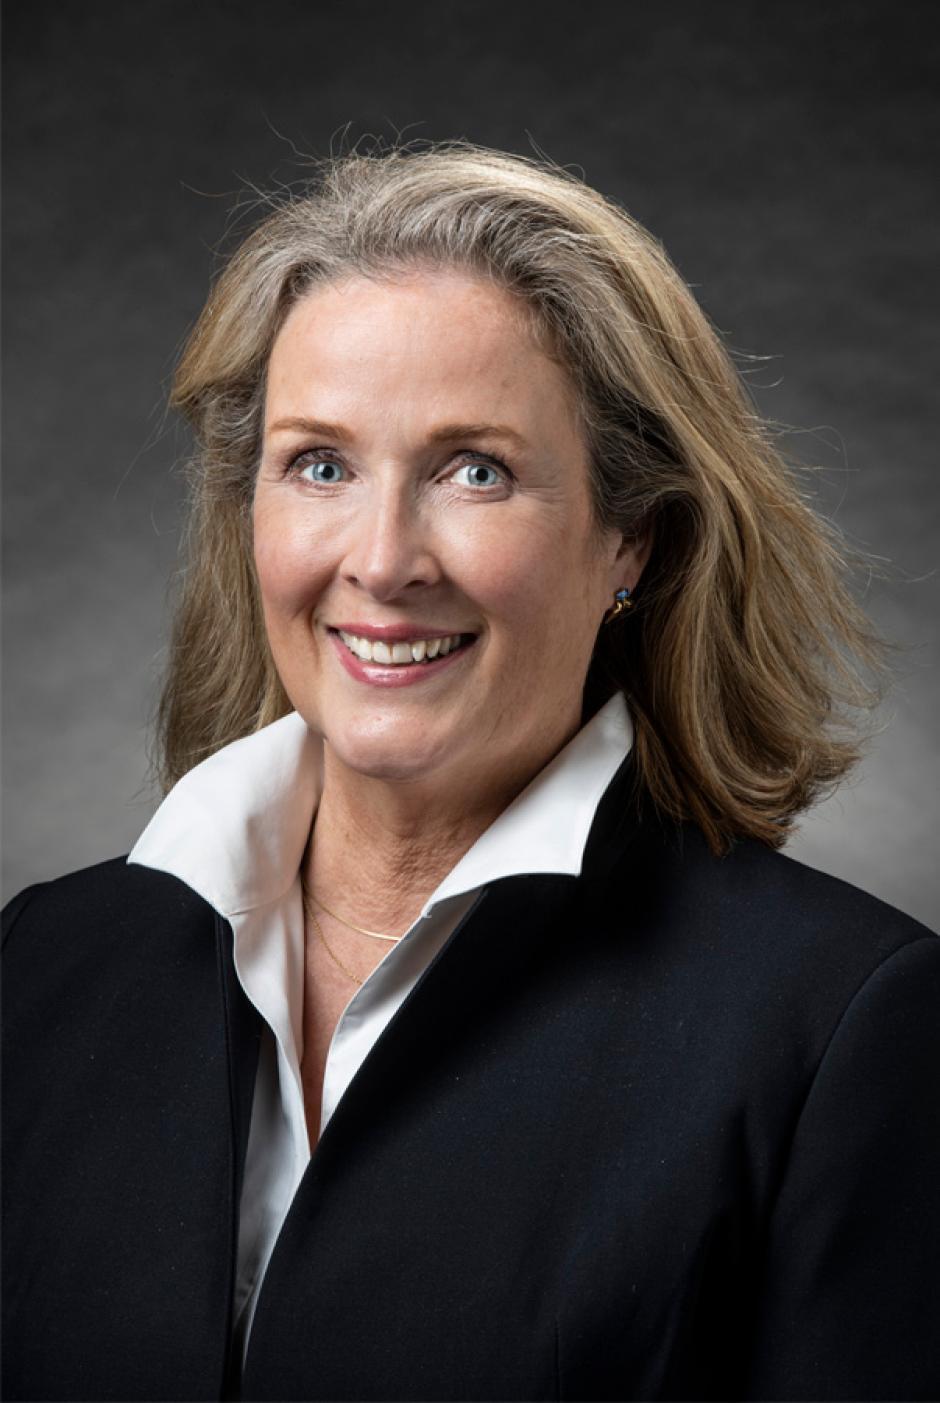 Headshot of Banff Centre Governor, Jill Price.